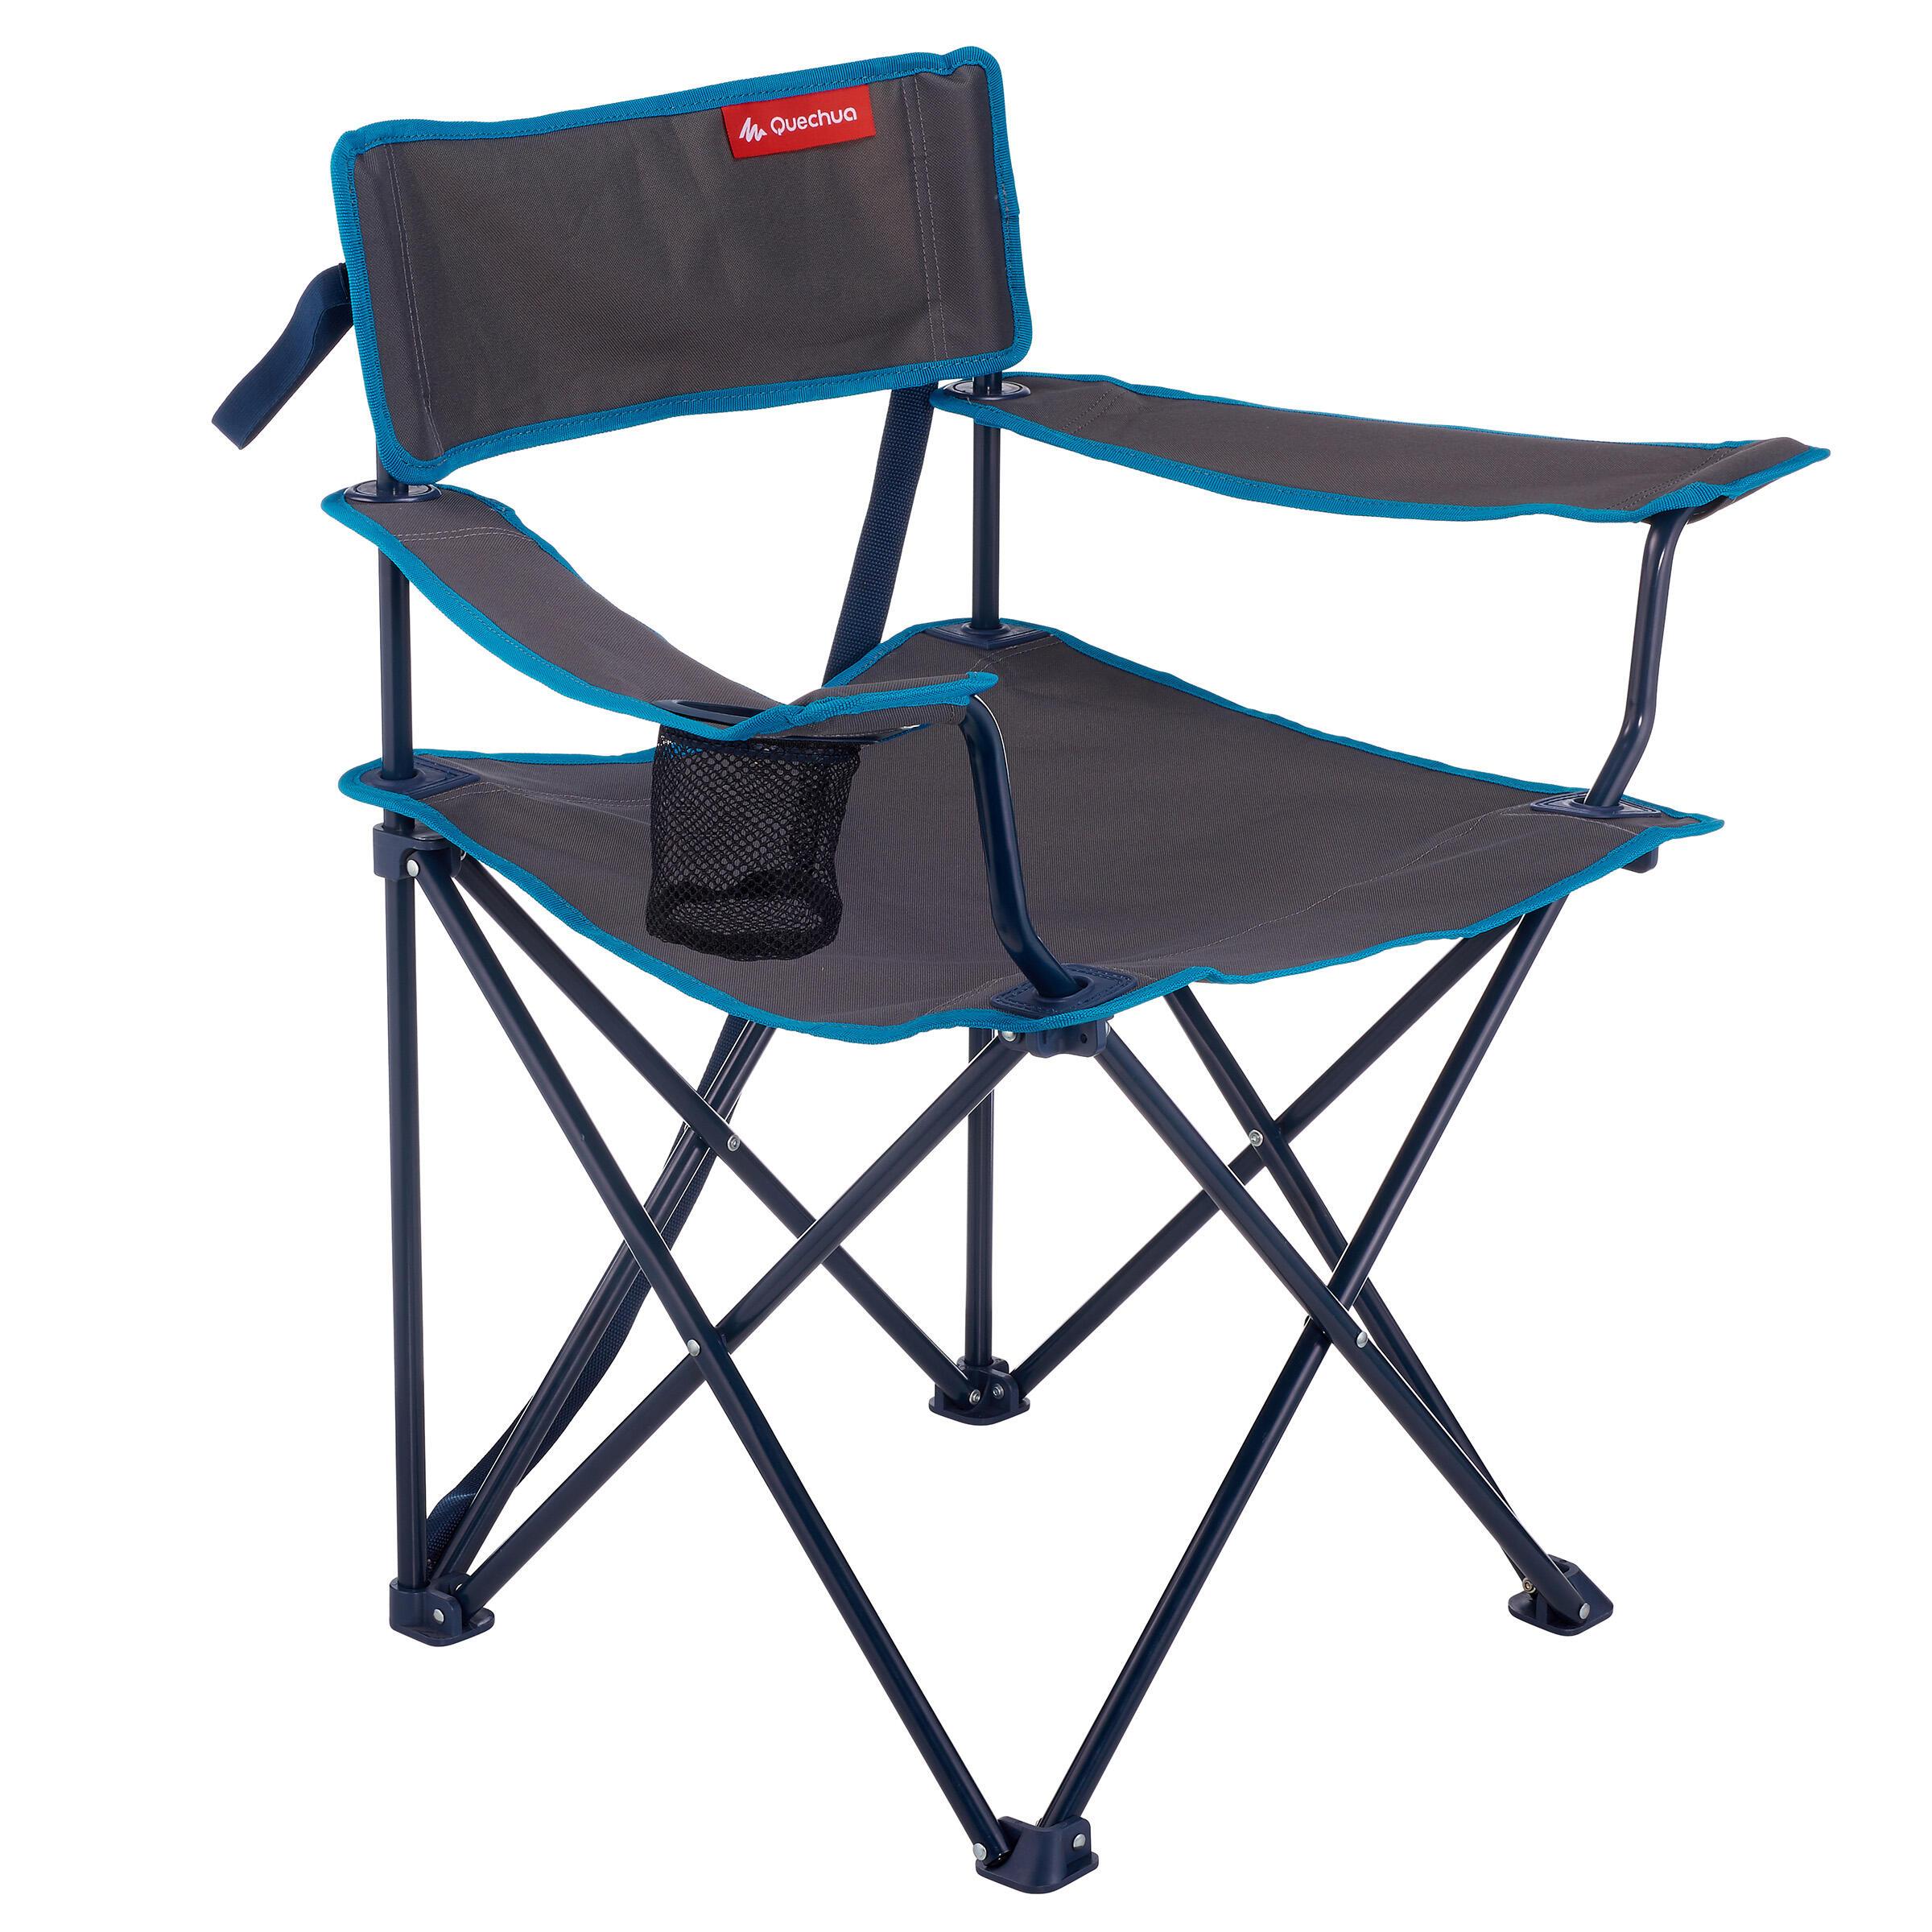 quechua fauteuil de camping pliant decathlon. Black Bedroom Furniture Sets. Home Design Ideas